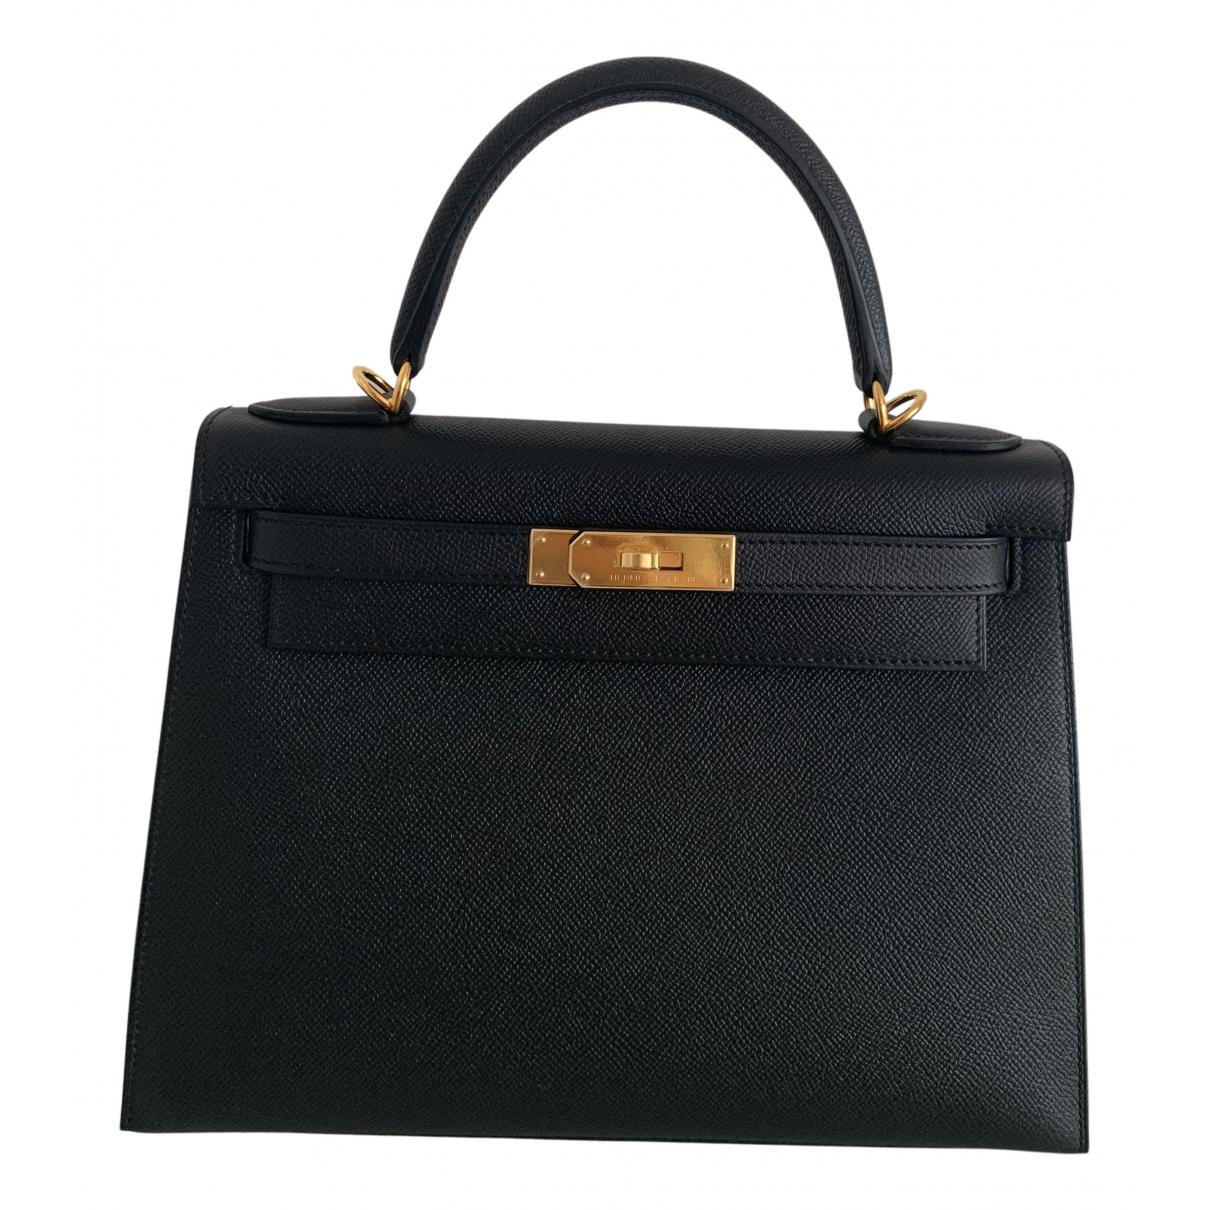 Hermès Kelly 28 Black Leather handbag for Women N